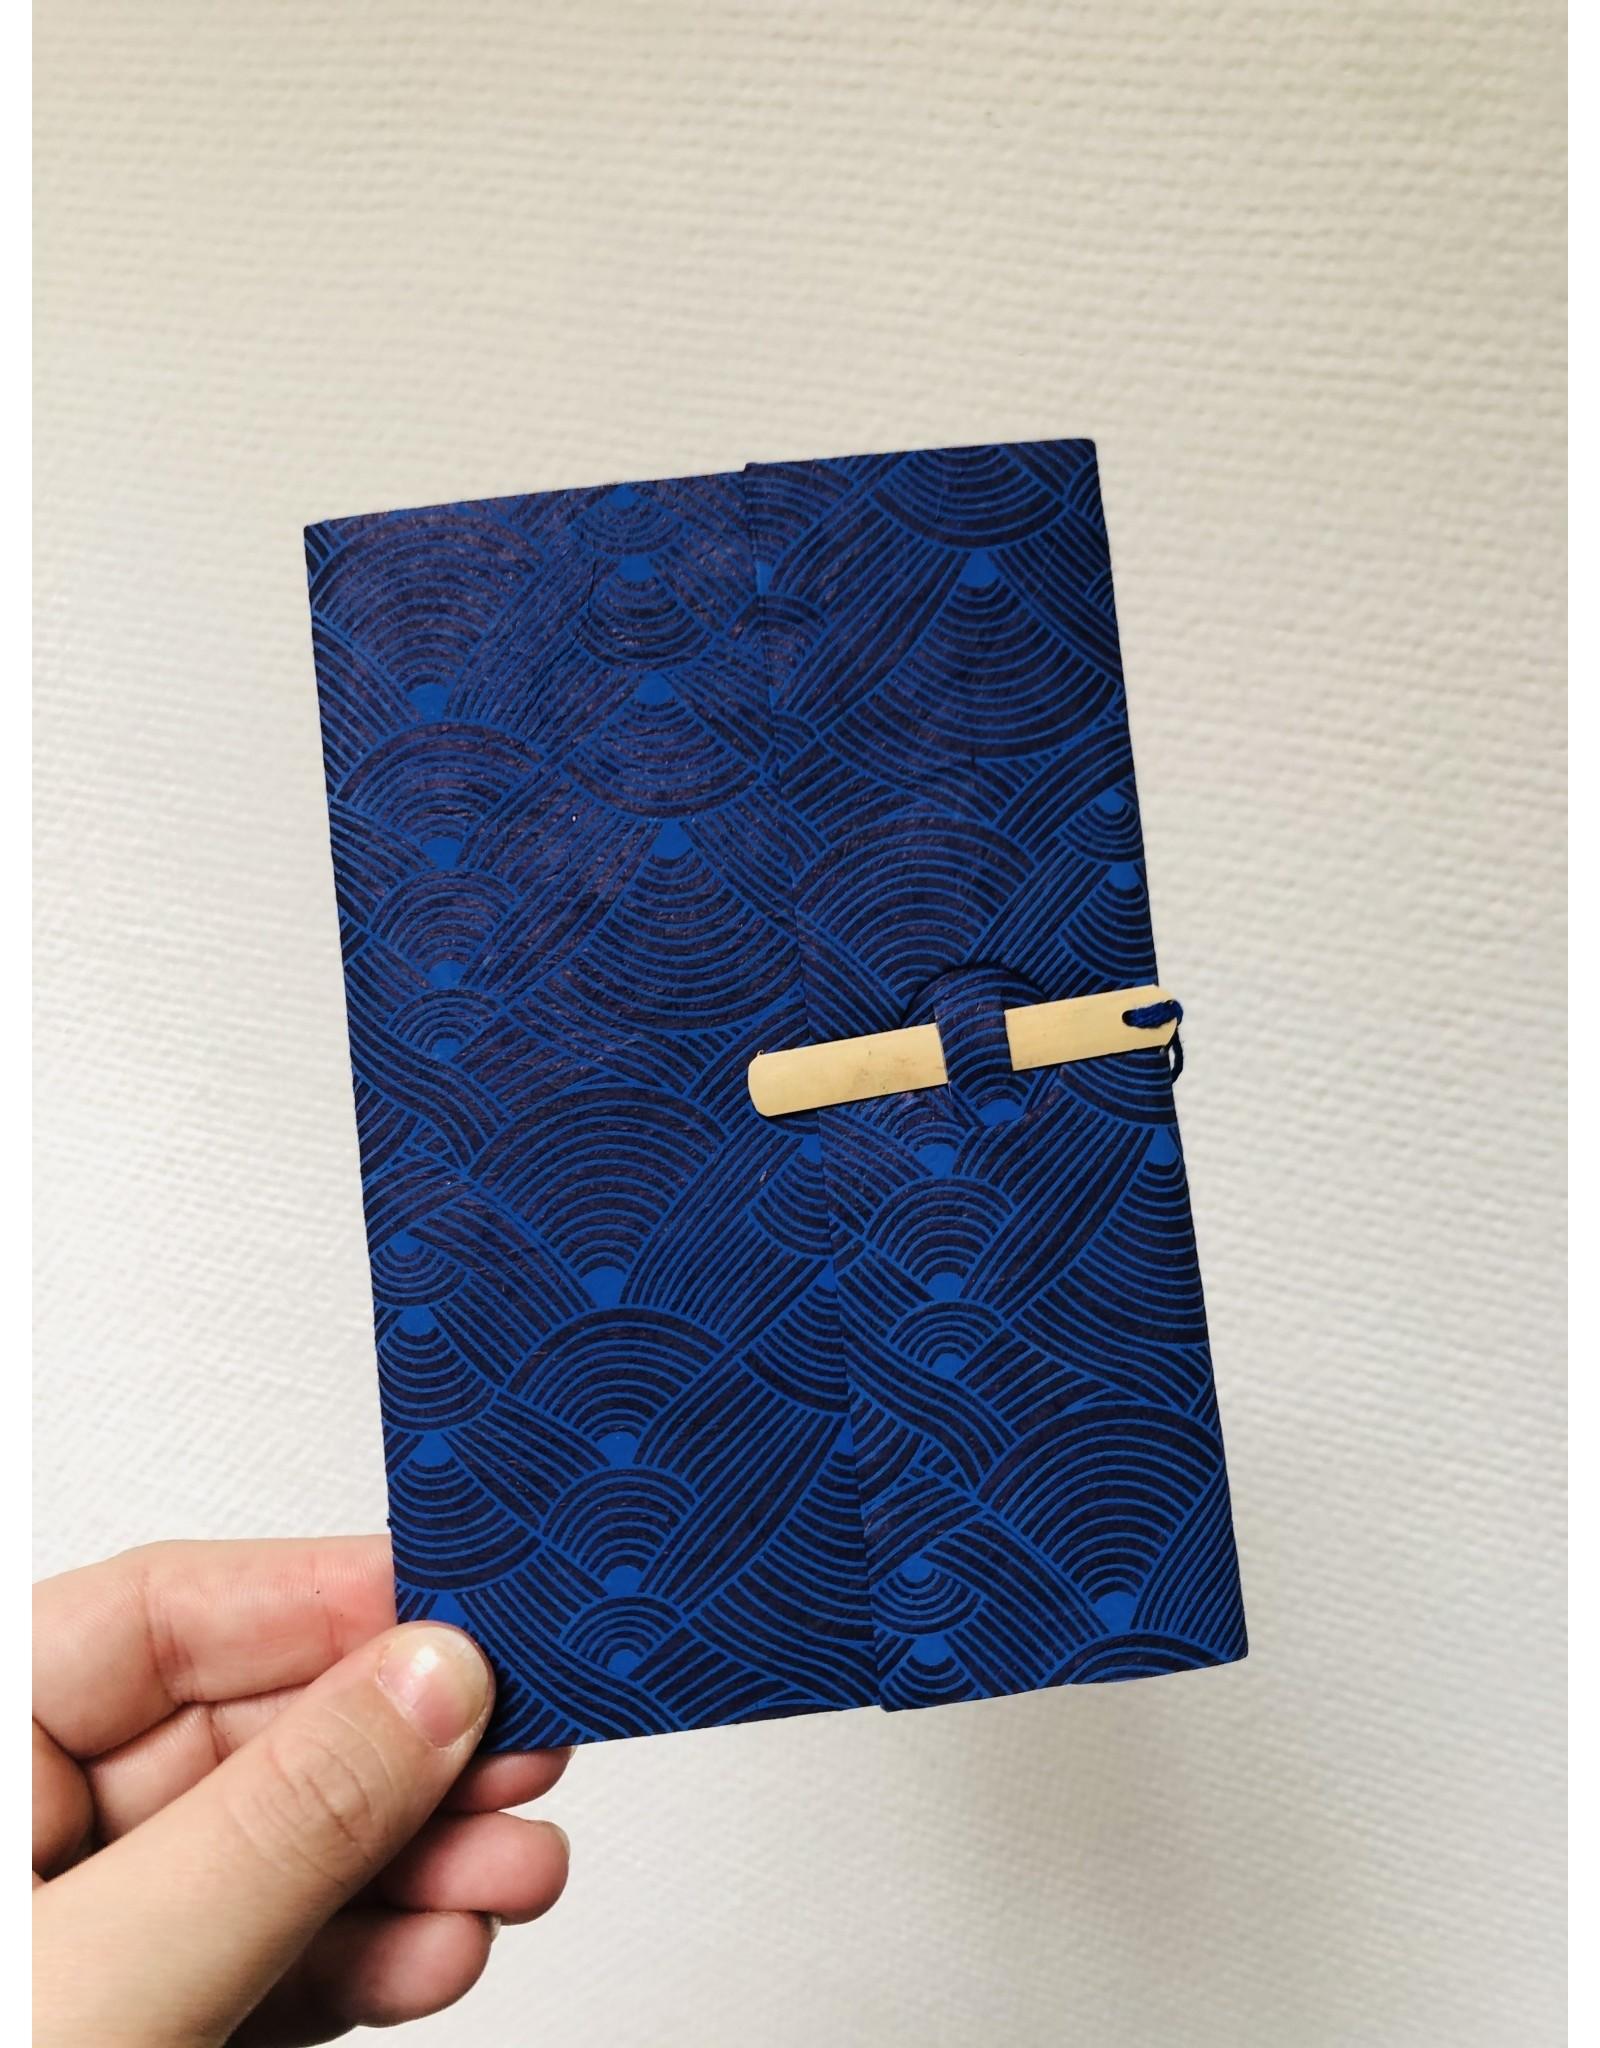 Lamali Boekje Escapade - Blauw Golven Patroon  - Zachte papieren kaft  - 20 ivoren pagina's - Handgemaakt 100% katoenpapier - 10  x 15,5 cm